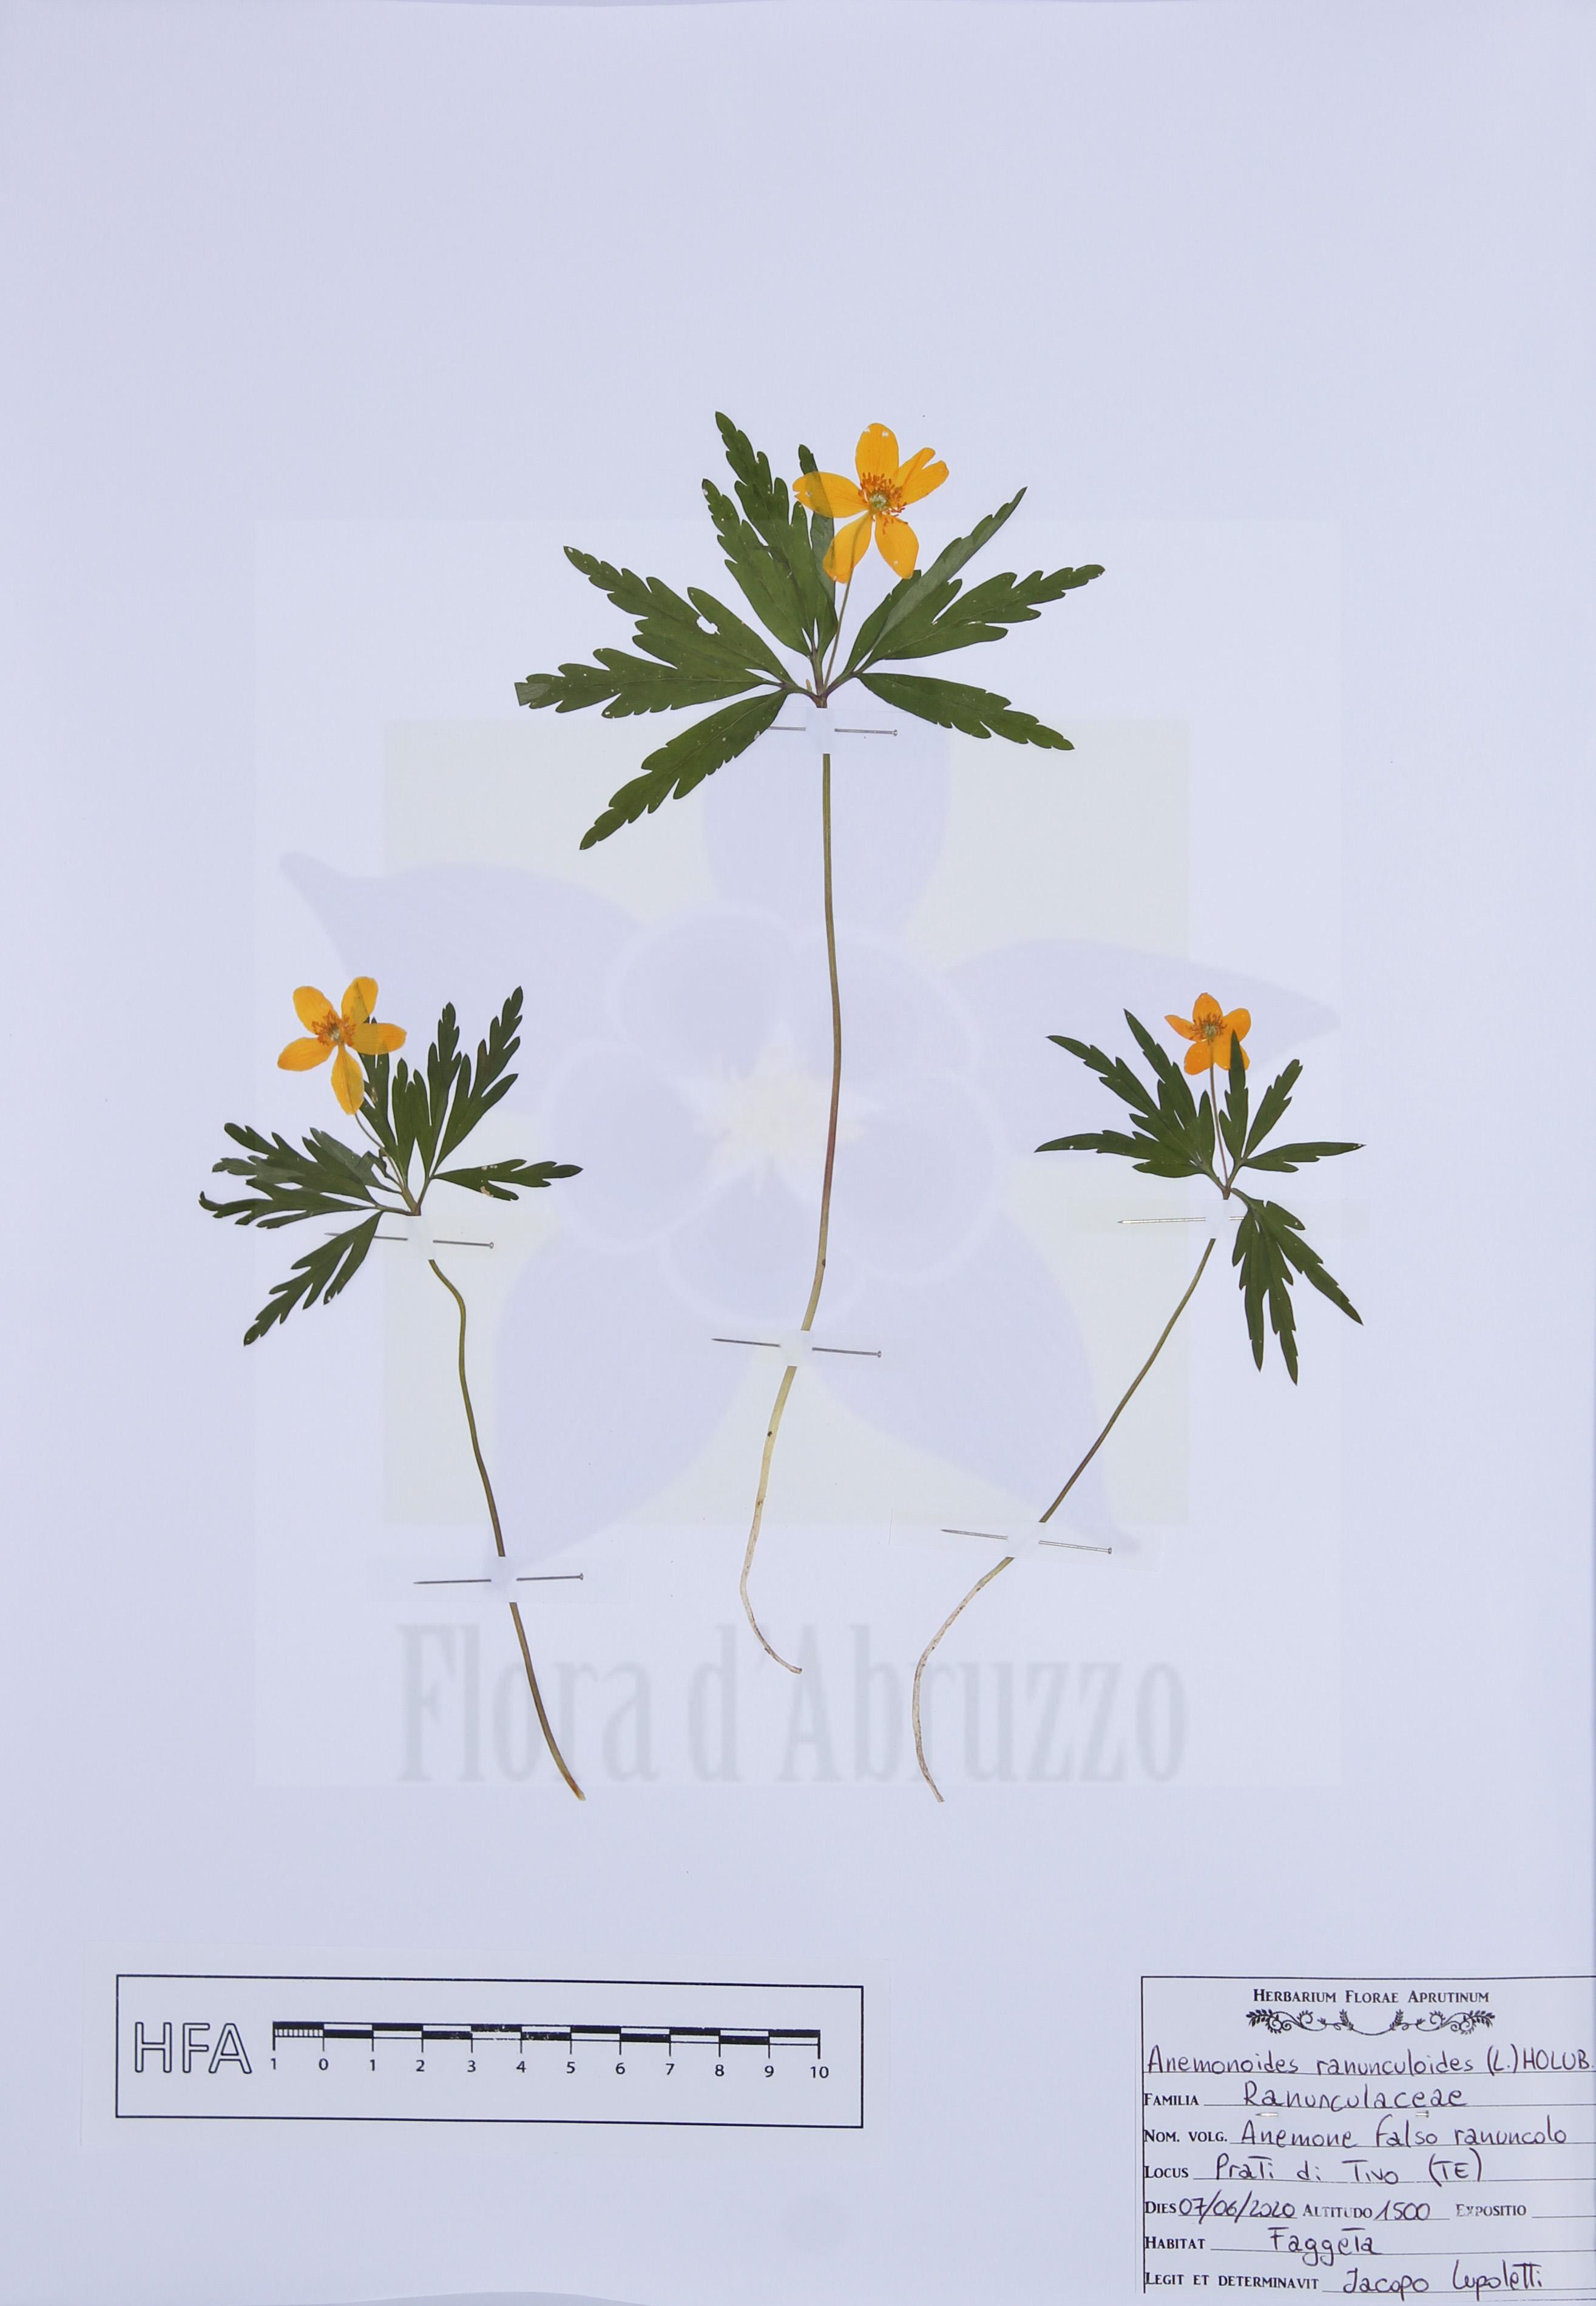 Anemonoides ranunculoides(L.) Holub